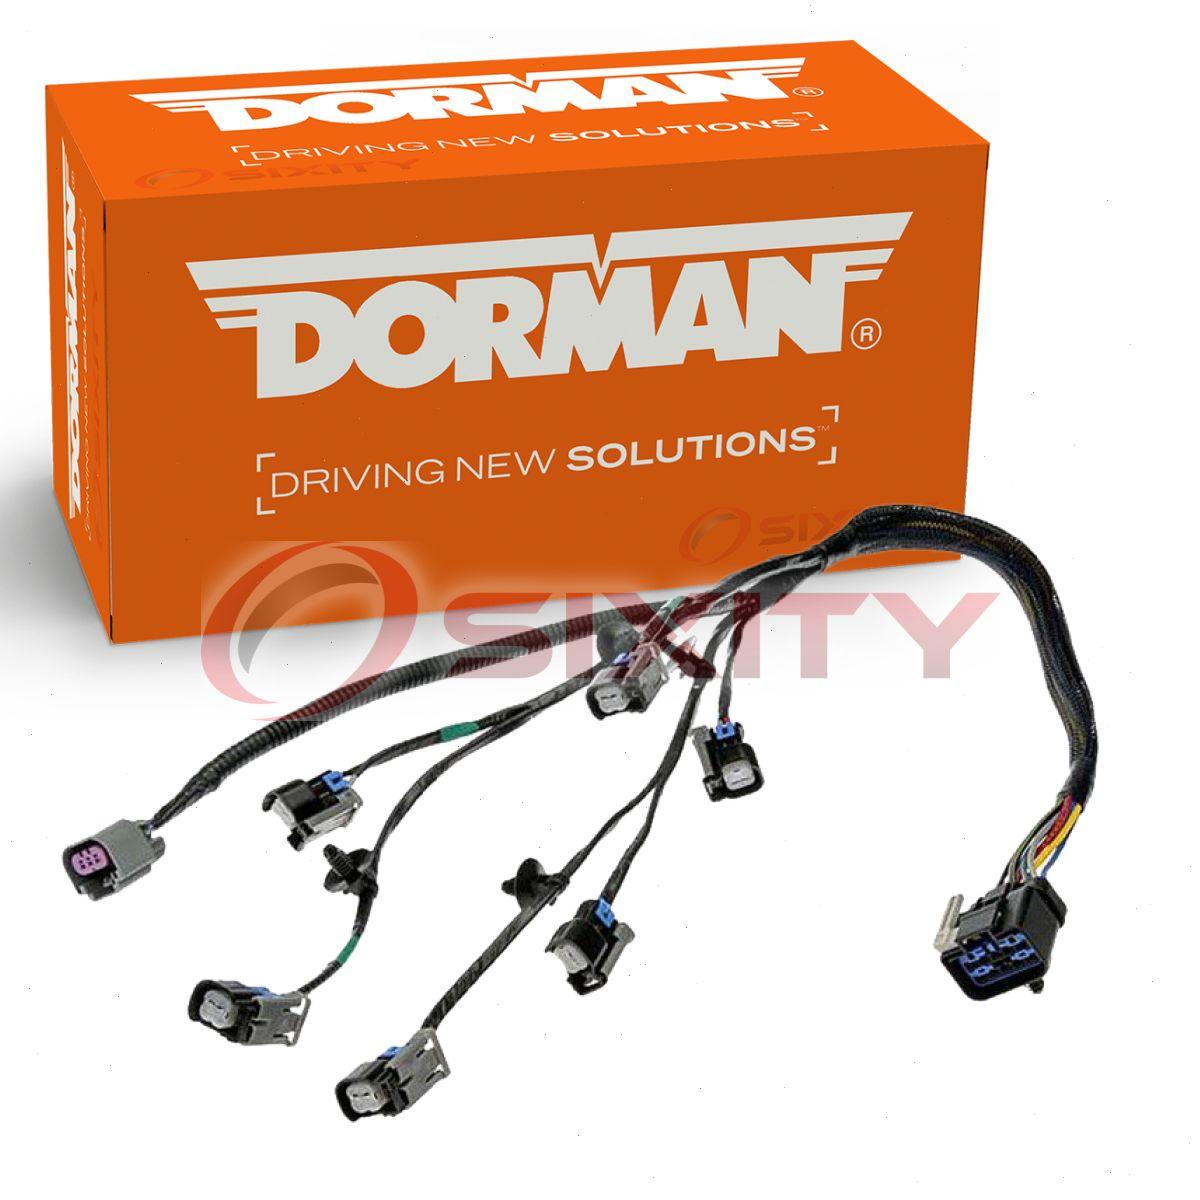 Dorman OE Solutions Dorman 911-089 Fuel Injector Wiring Harness